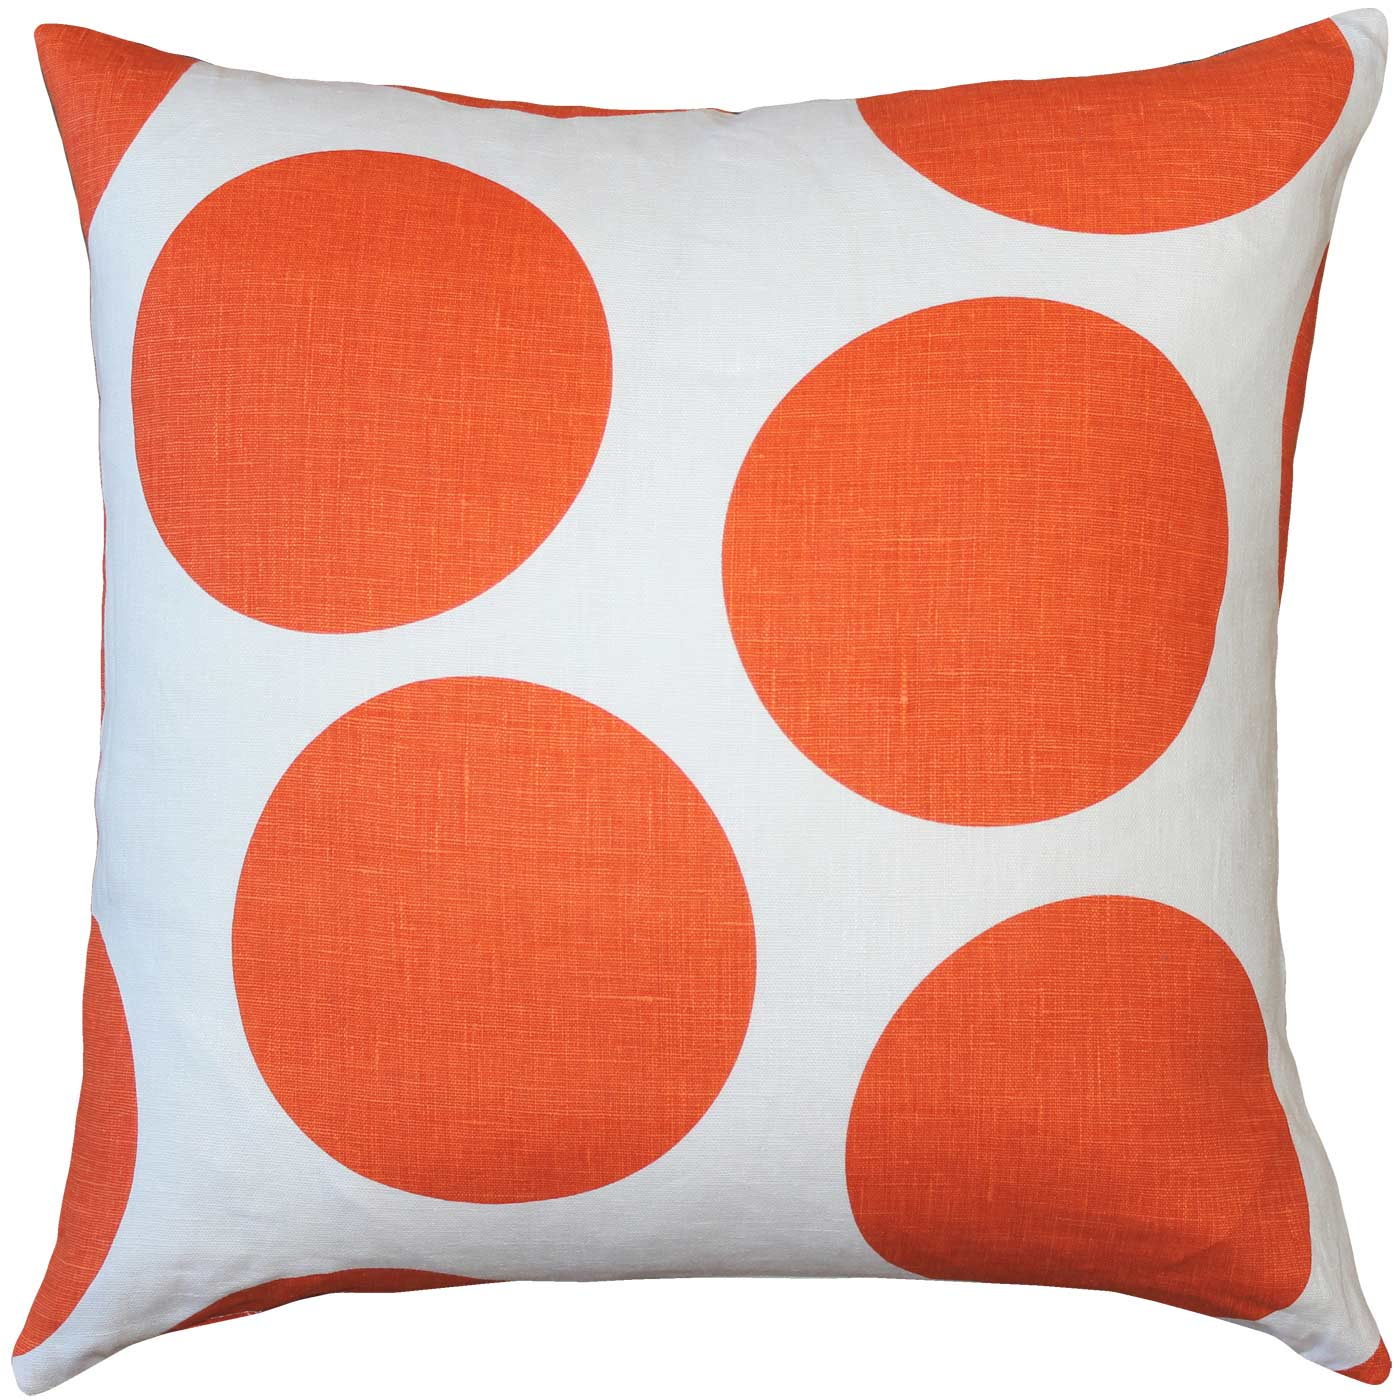 Tuscany Linen Orange Circles Pillow